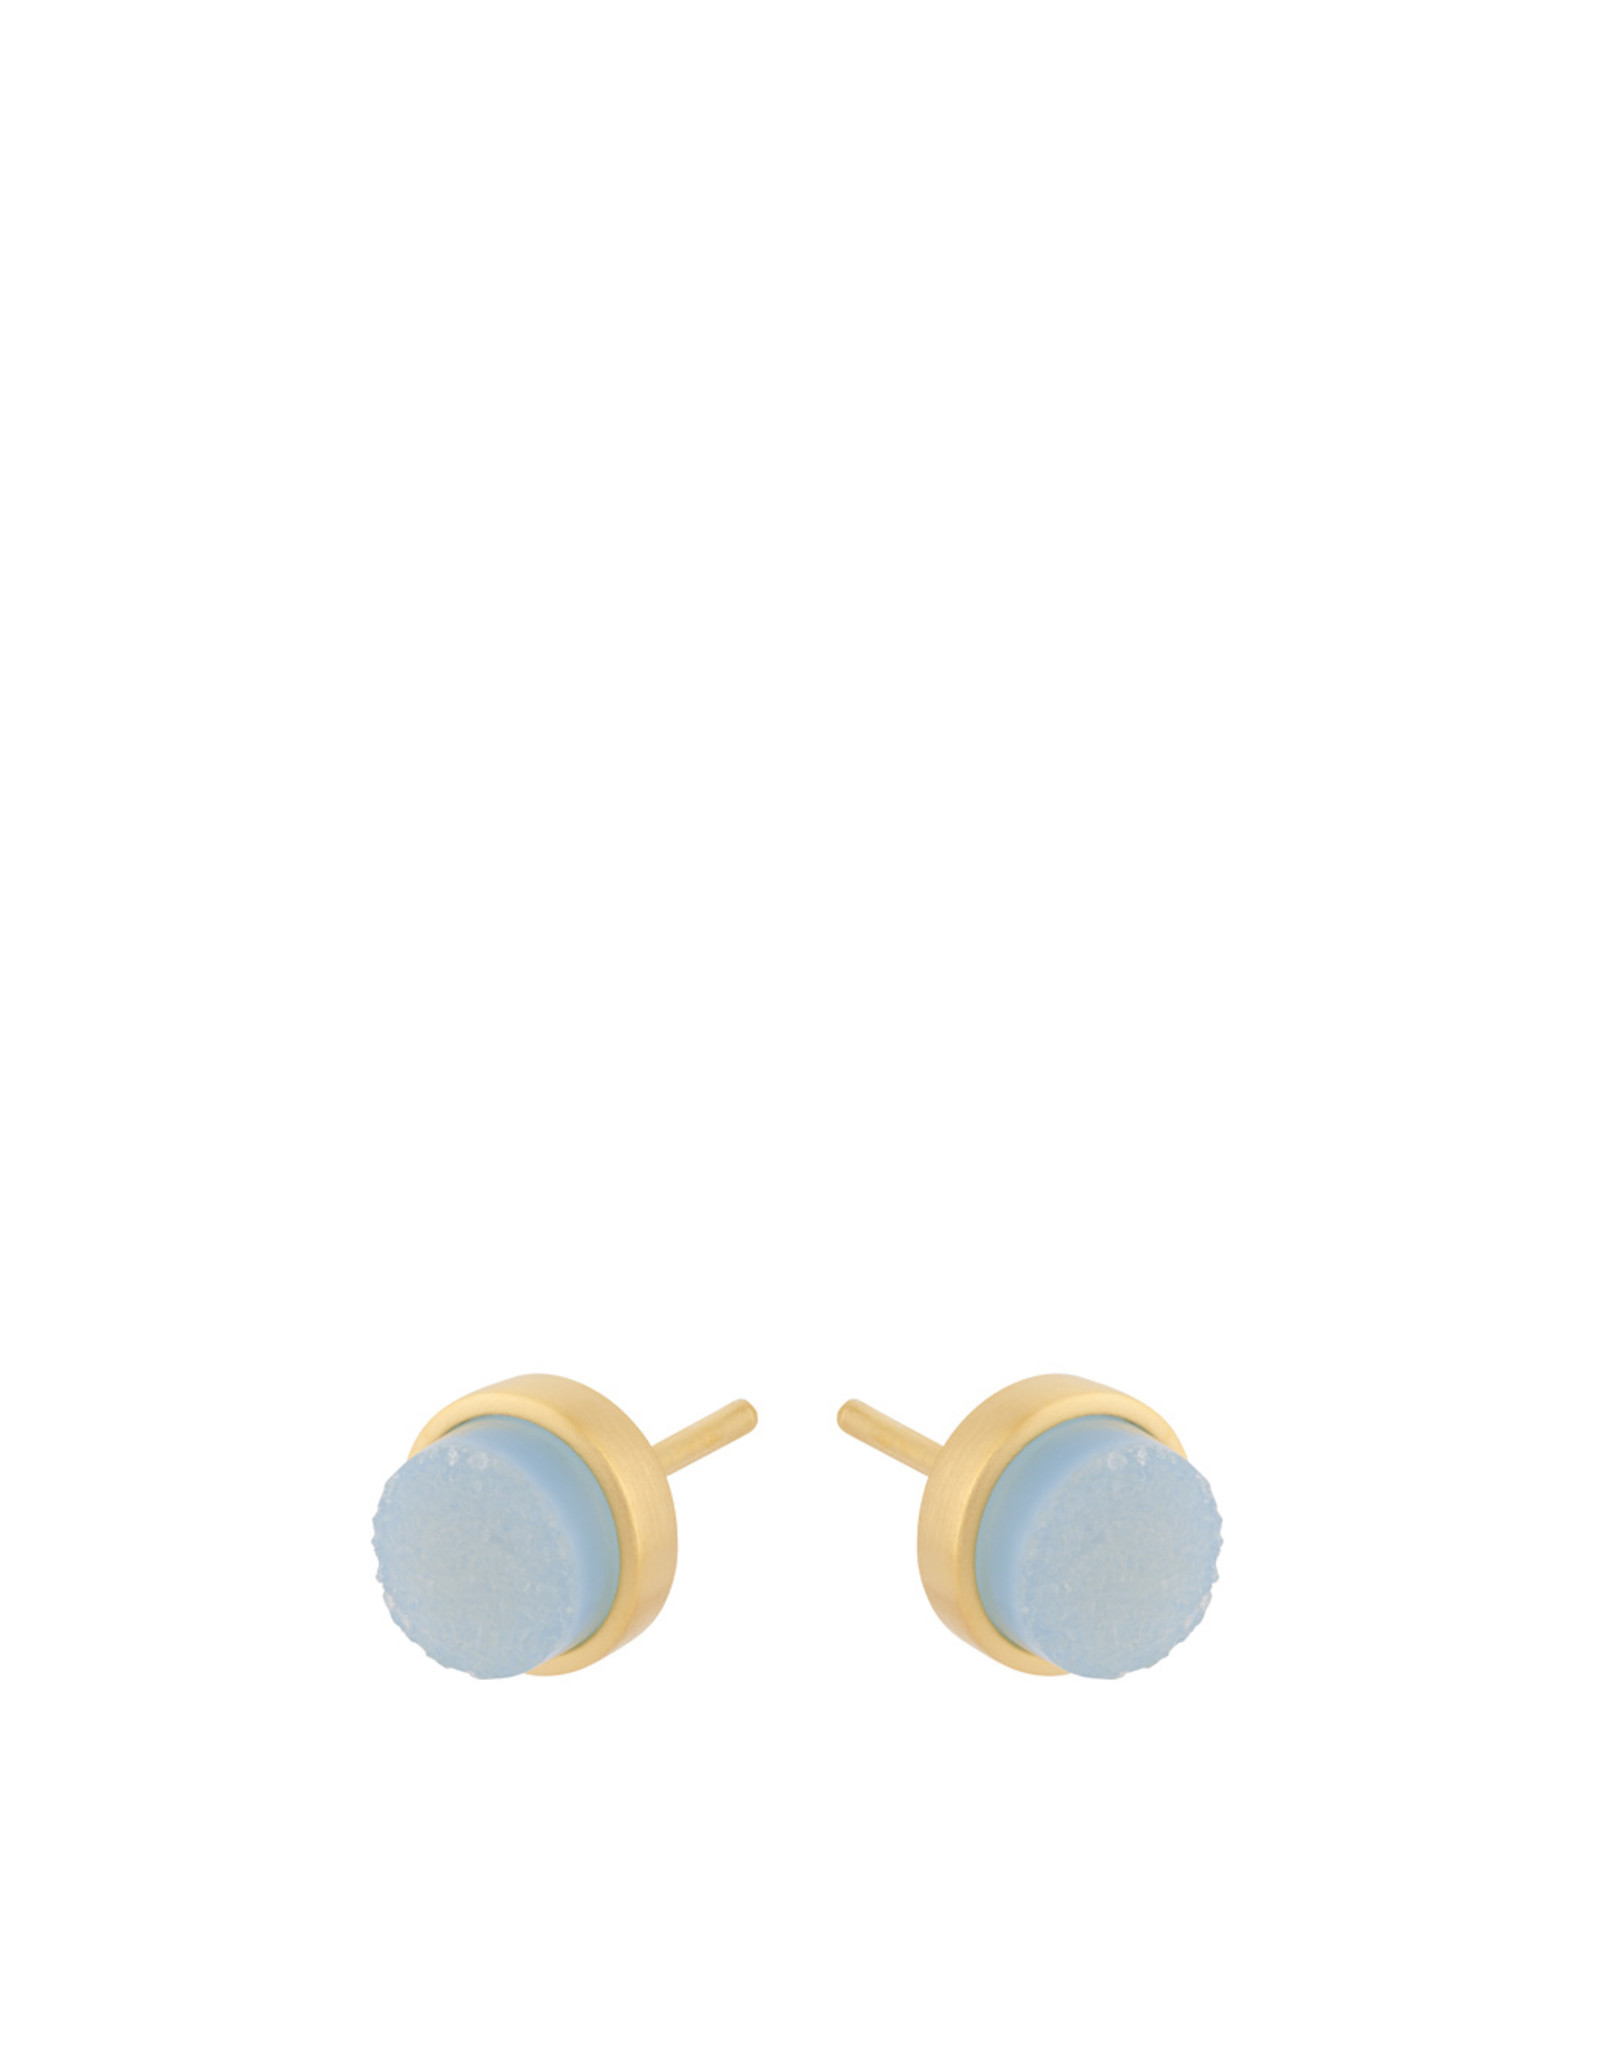 Pernille Corydon Shallow Earsticks Blue Druzy 6mm